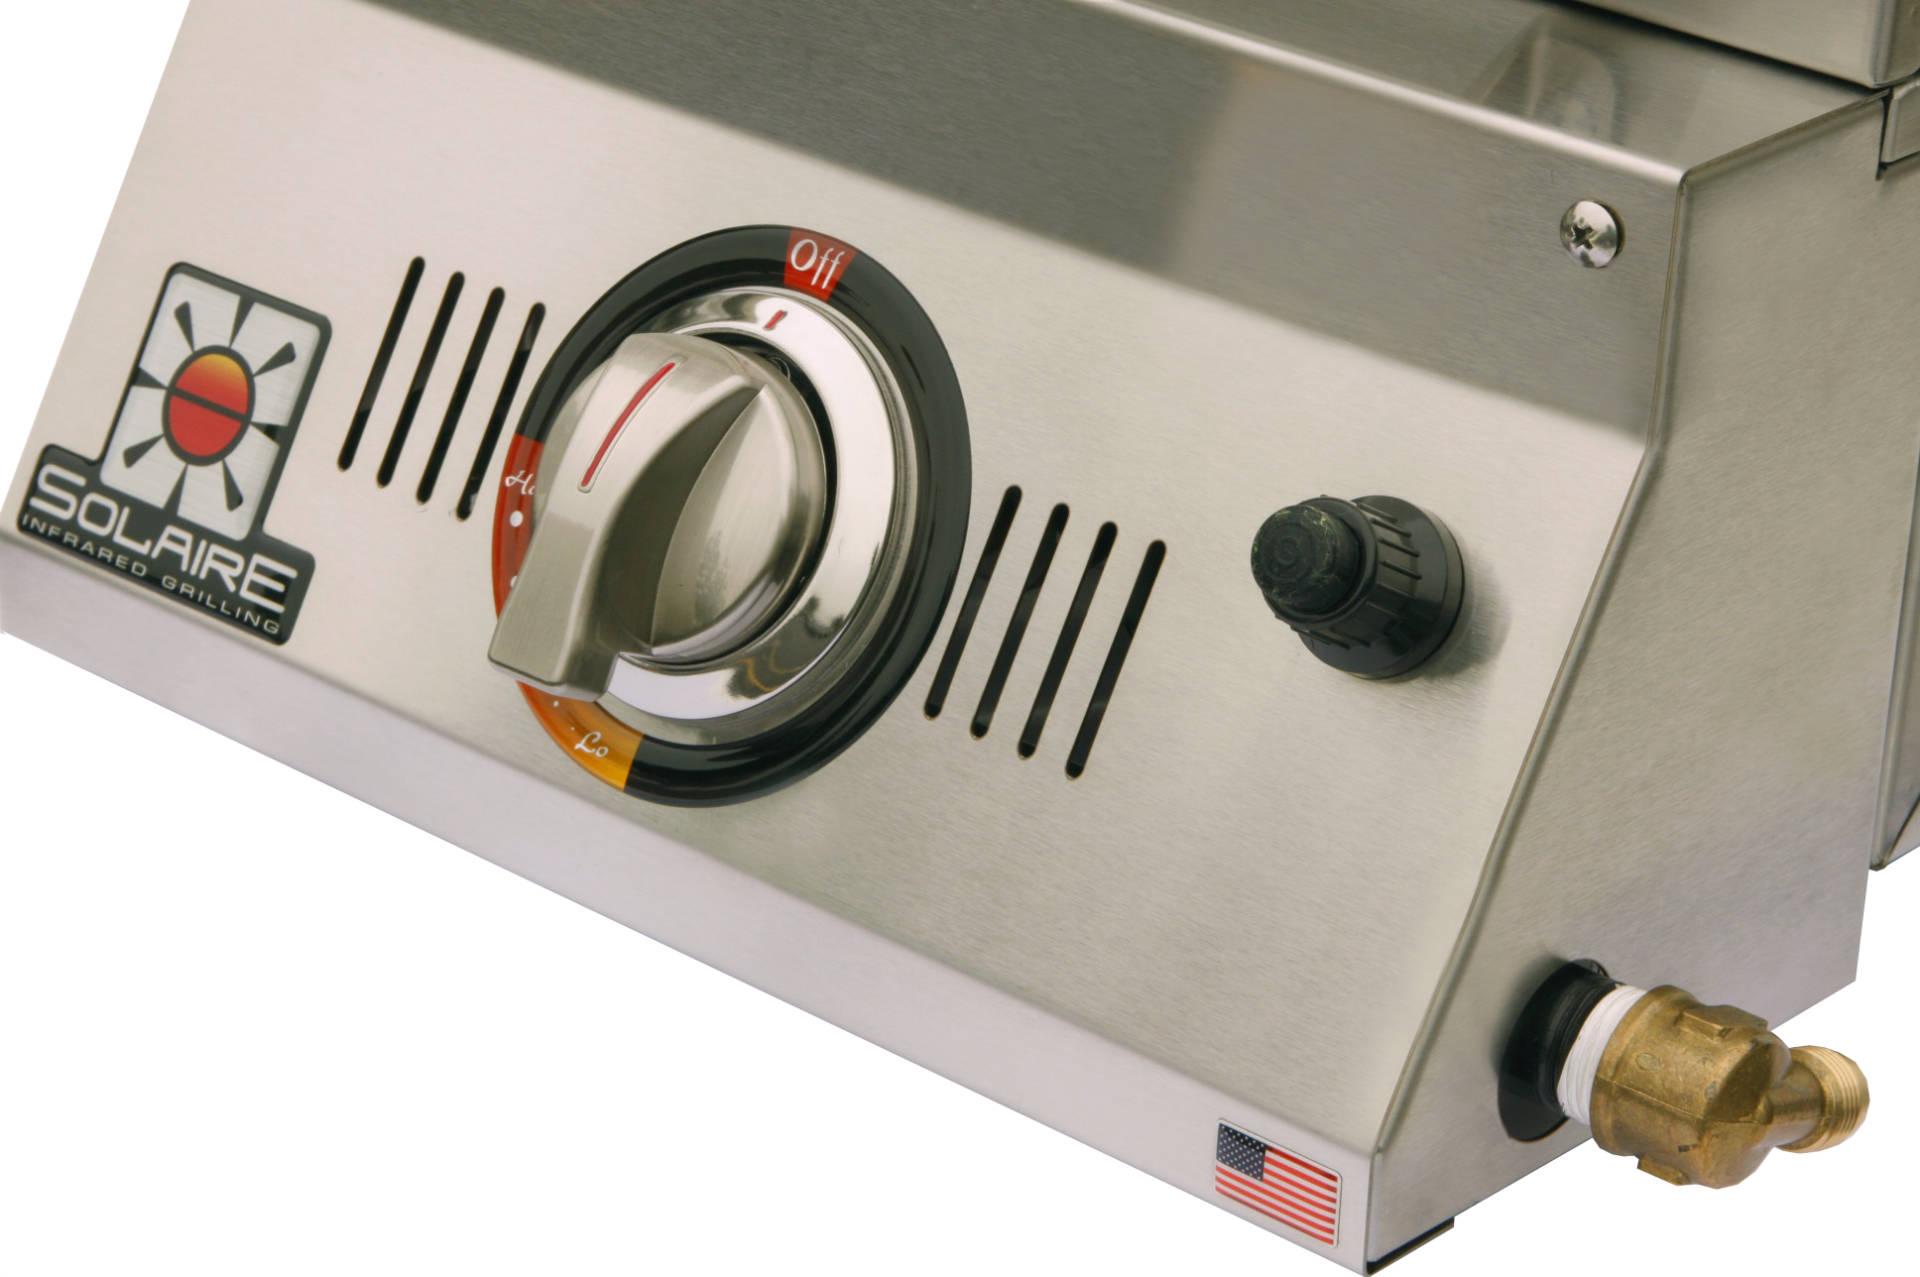 AA12A_rf_panel-r100-w1920